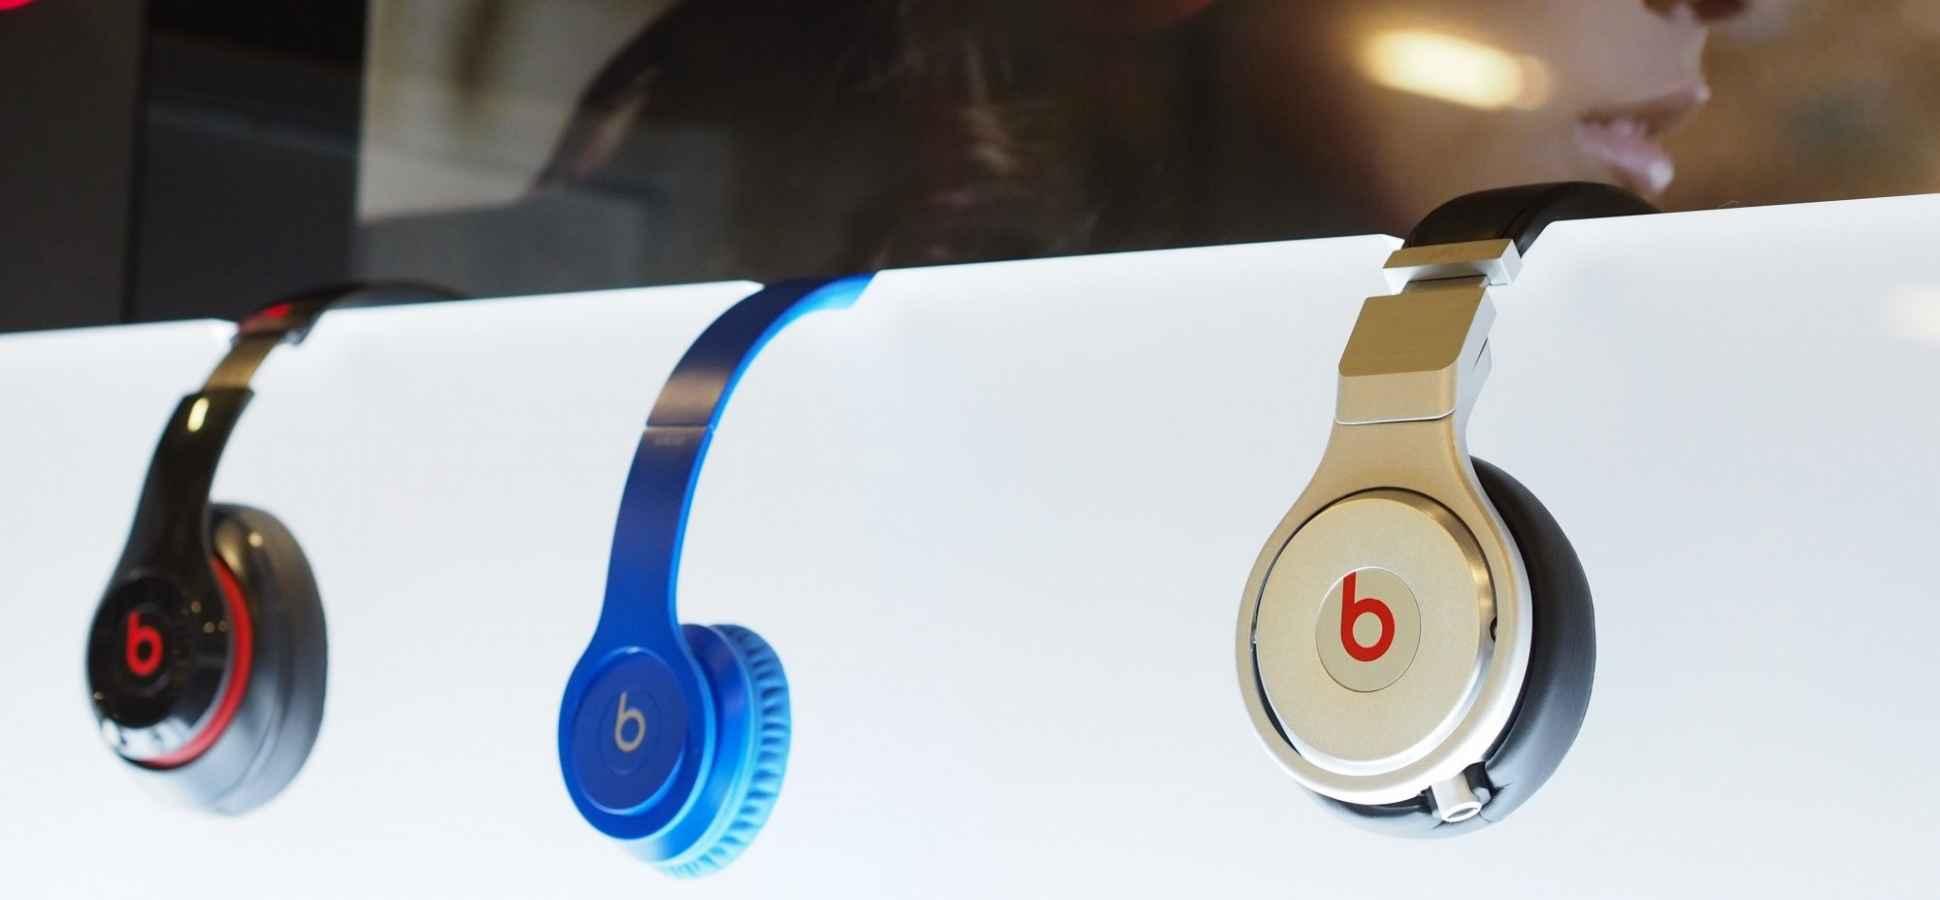 Apple Announces It Will Shut Down Beats Music